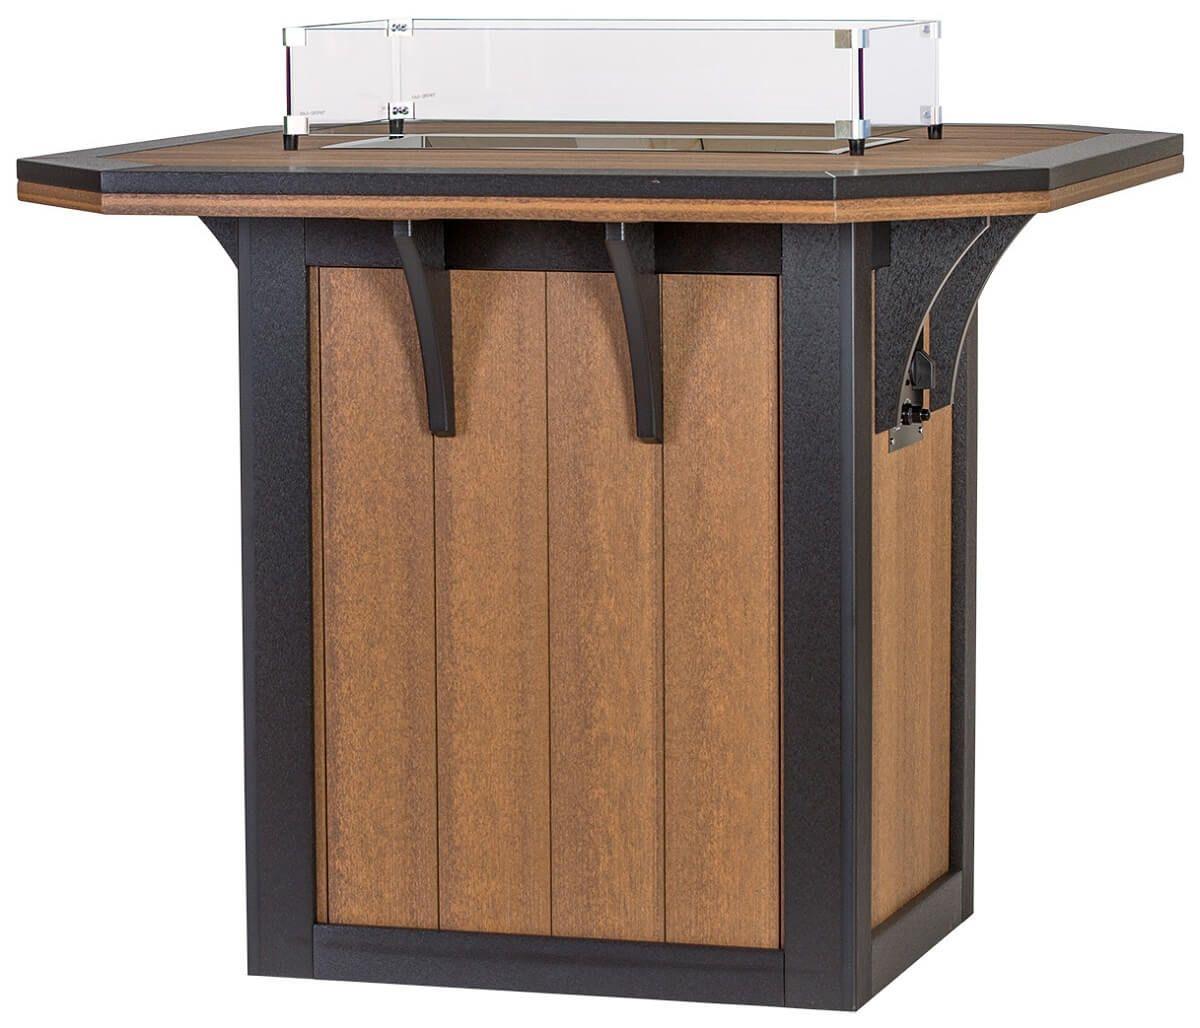 Carrabelle Fire Bar Table